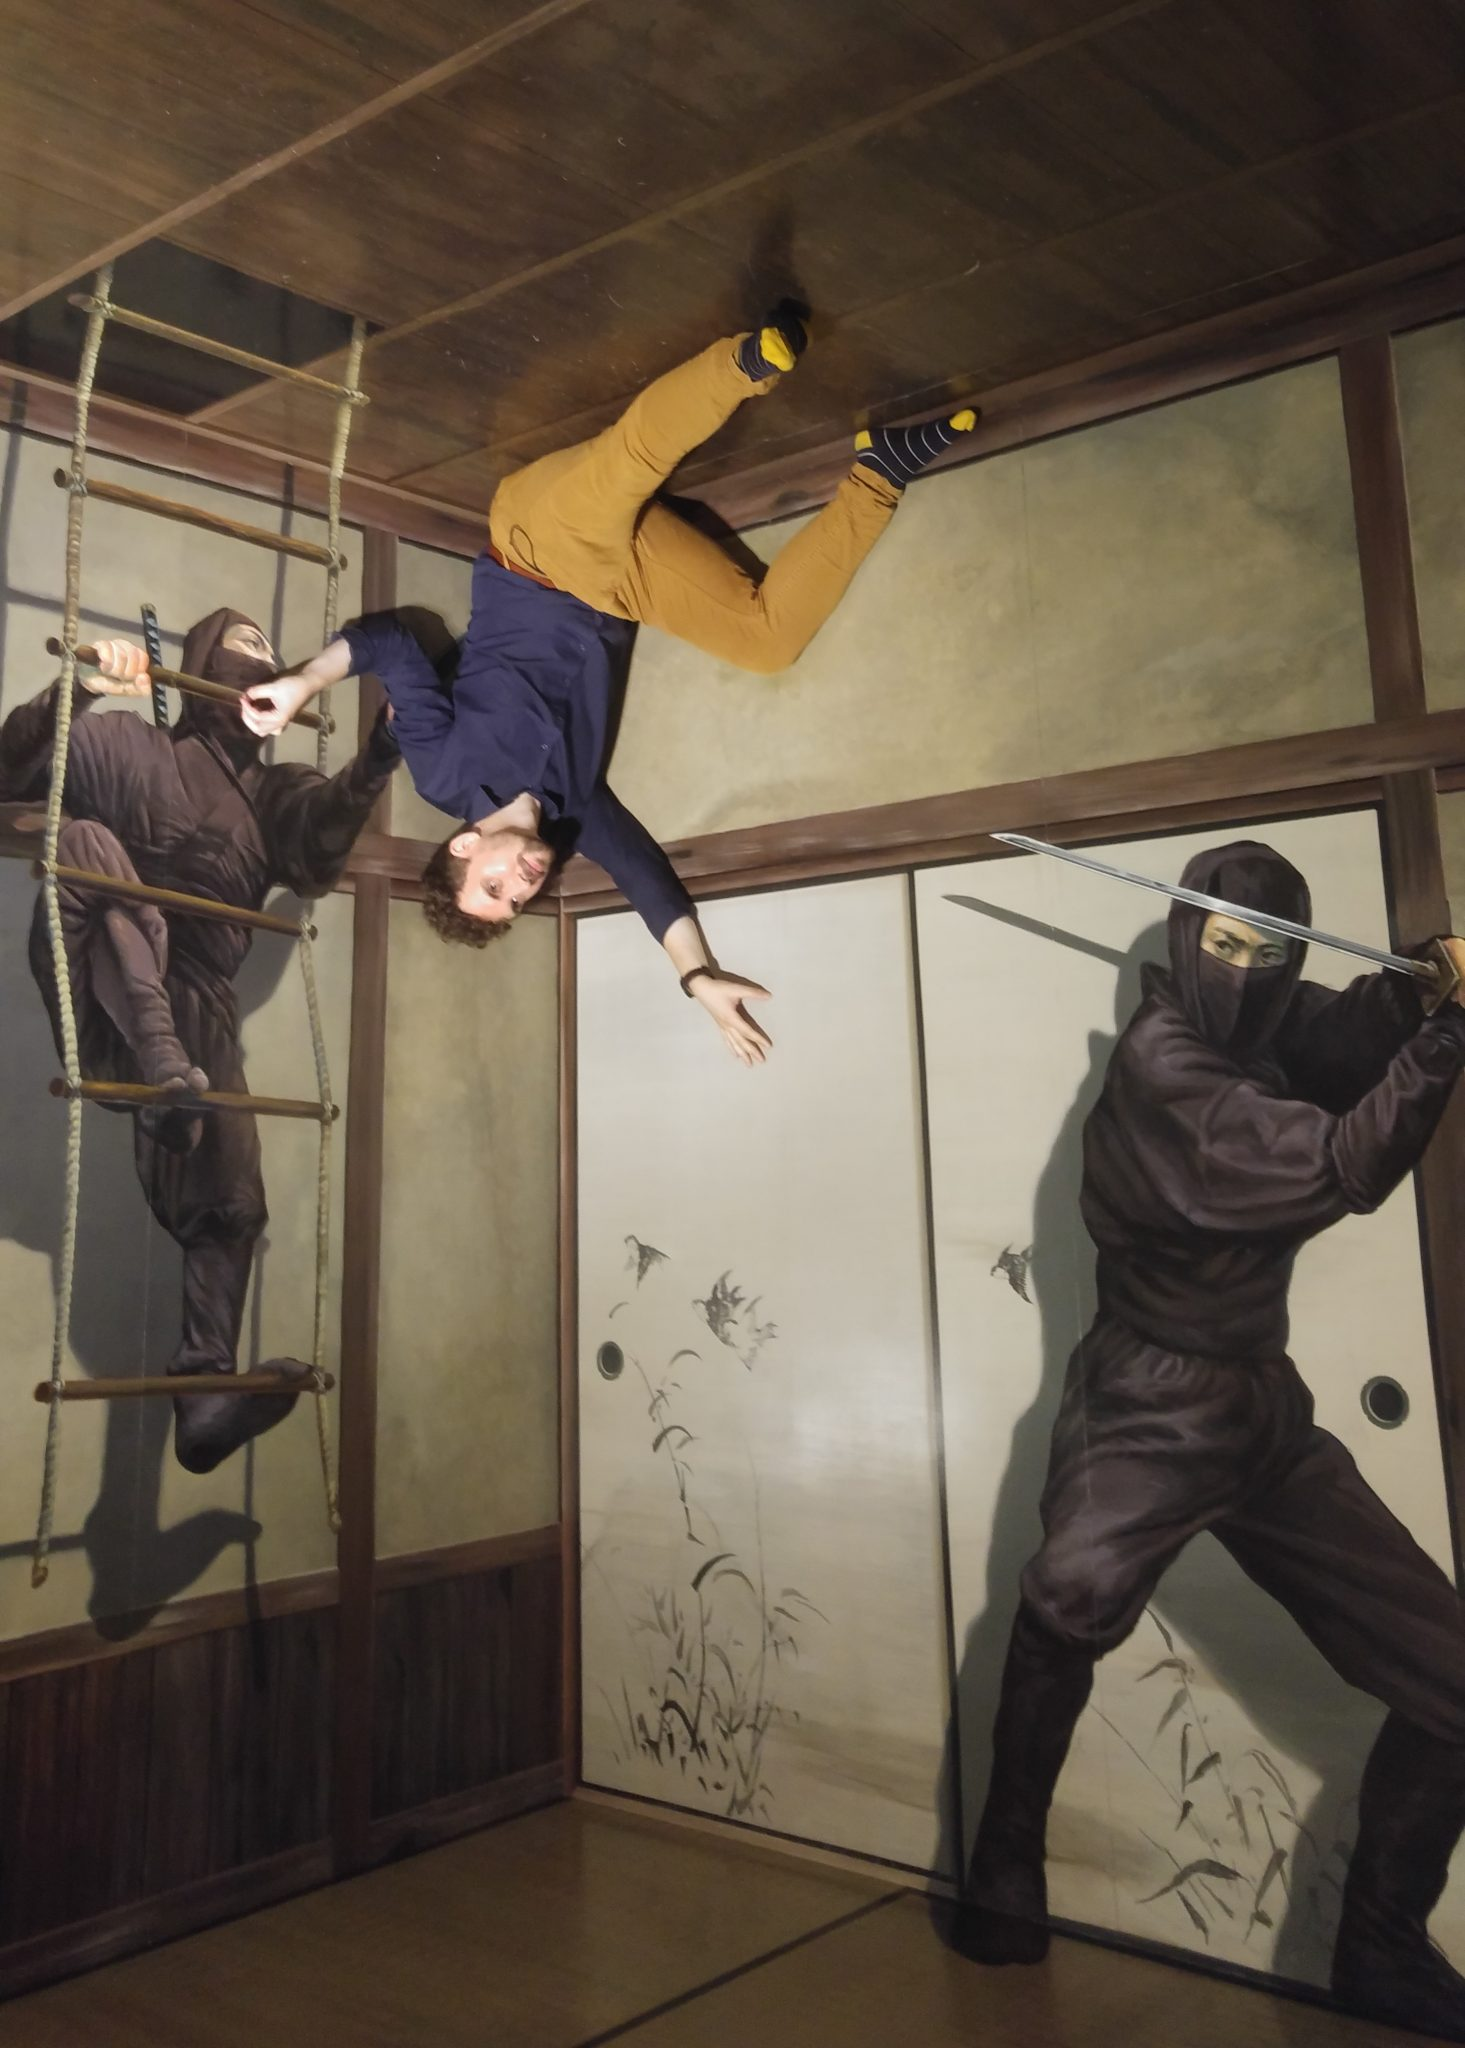 ninja-tokyo-trick-art-museum-tokyo